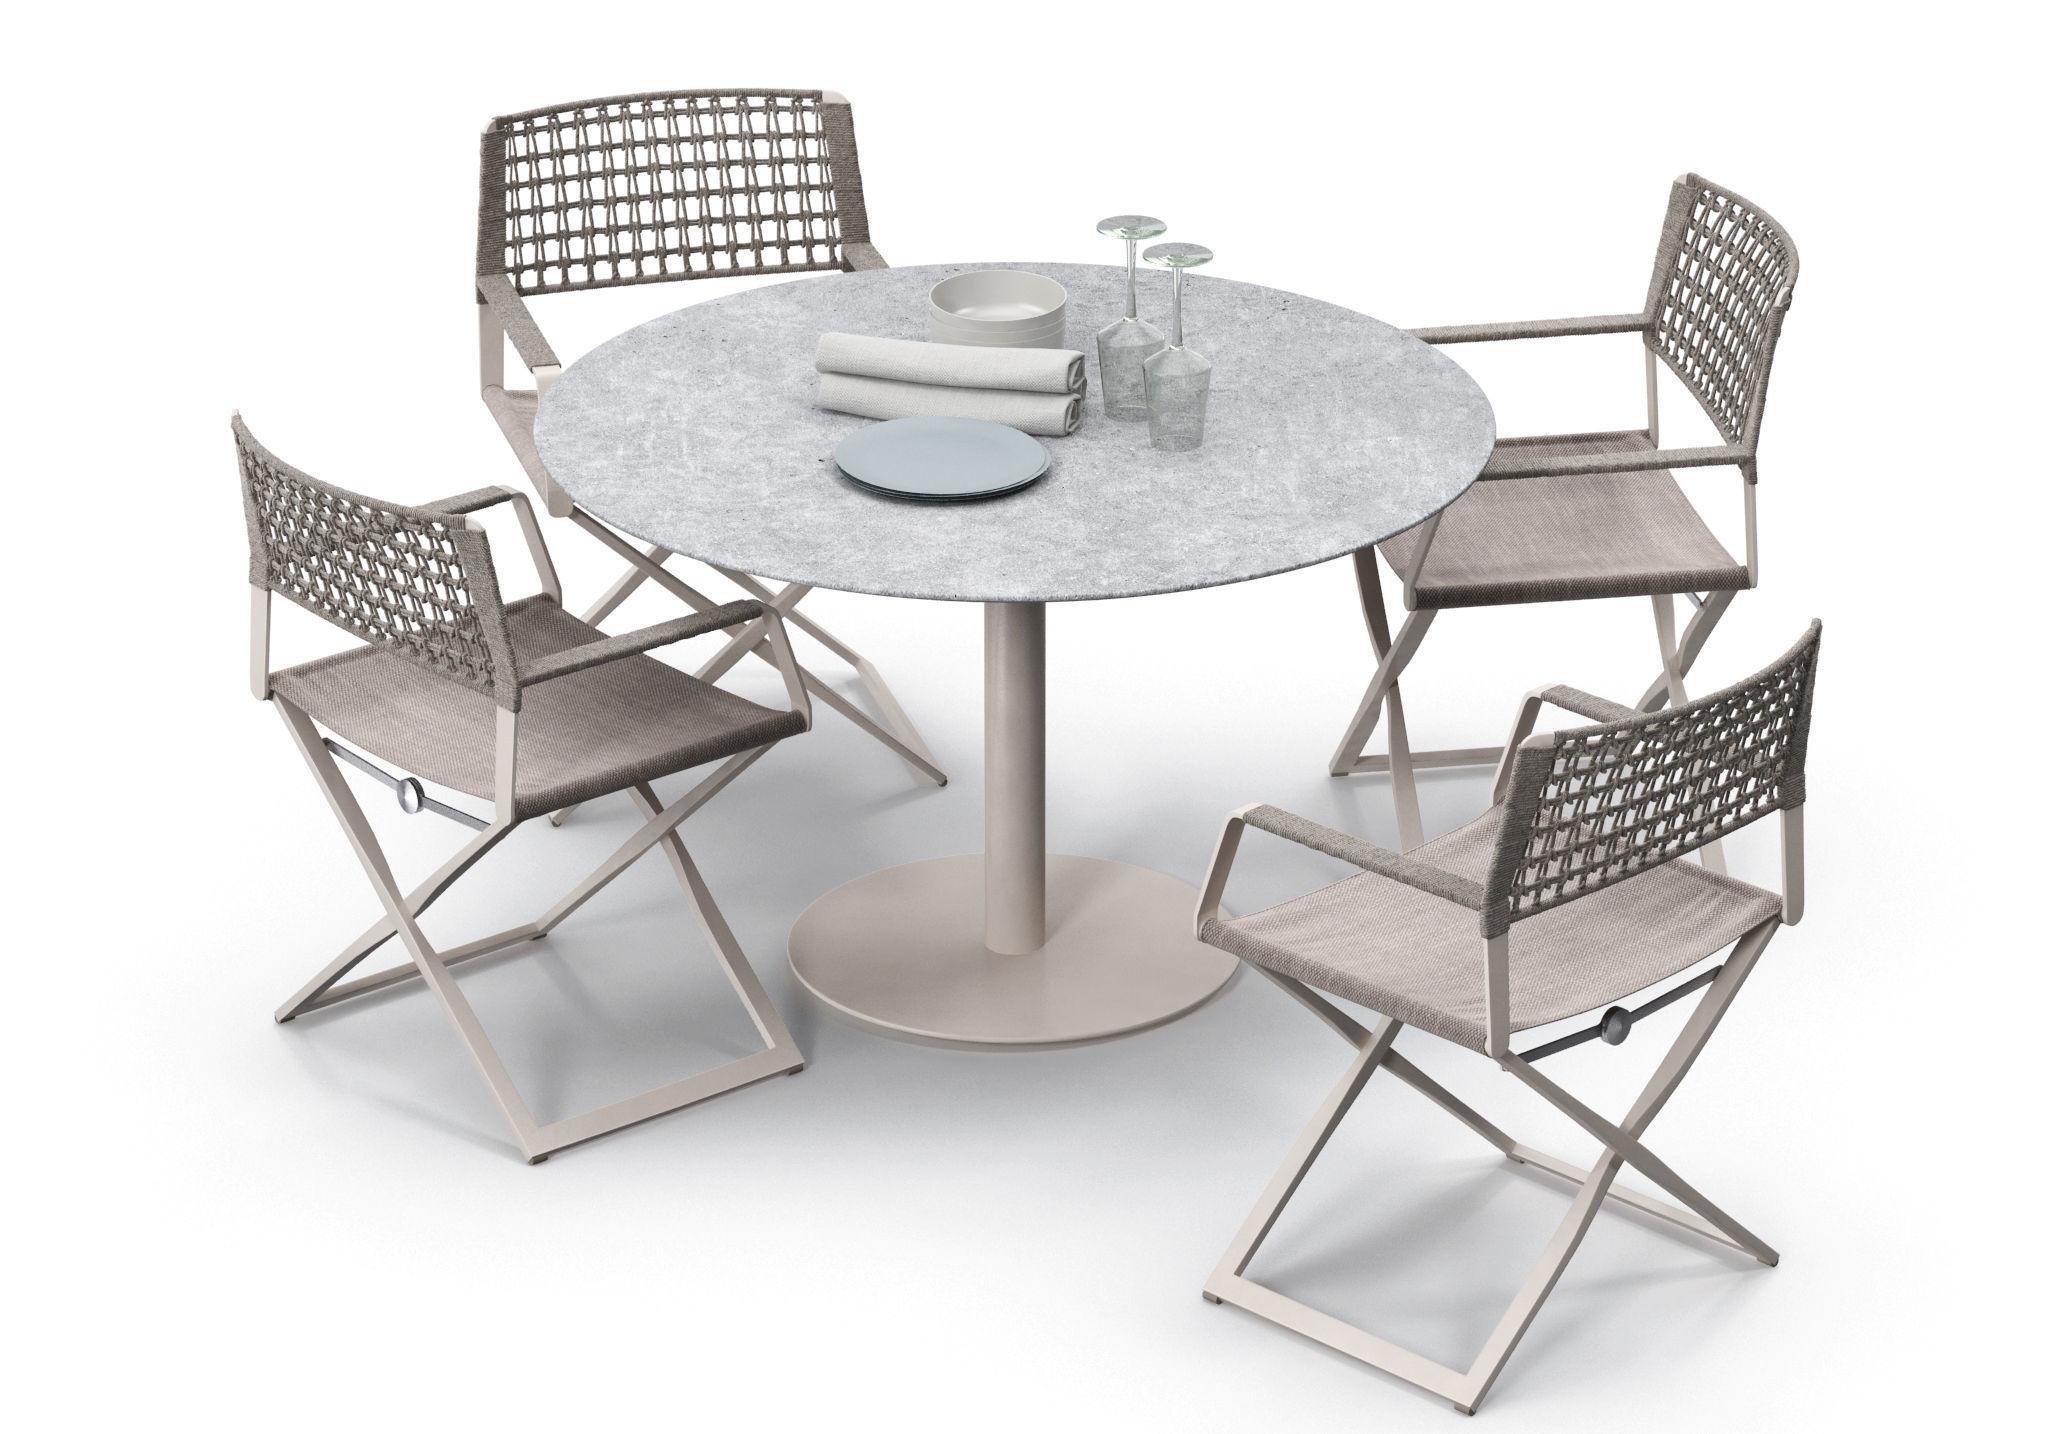 3D Tribu Regista armchair set 2 | CGTrader